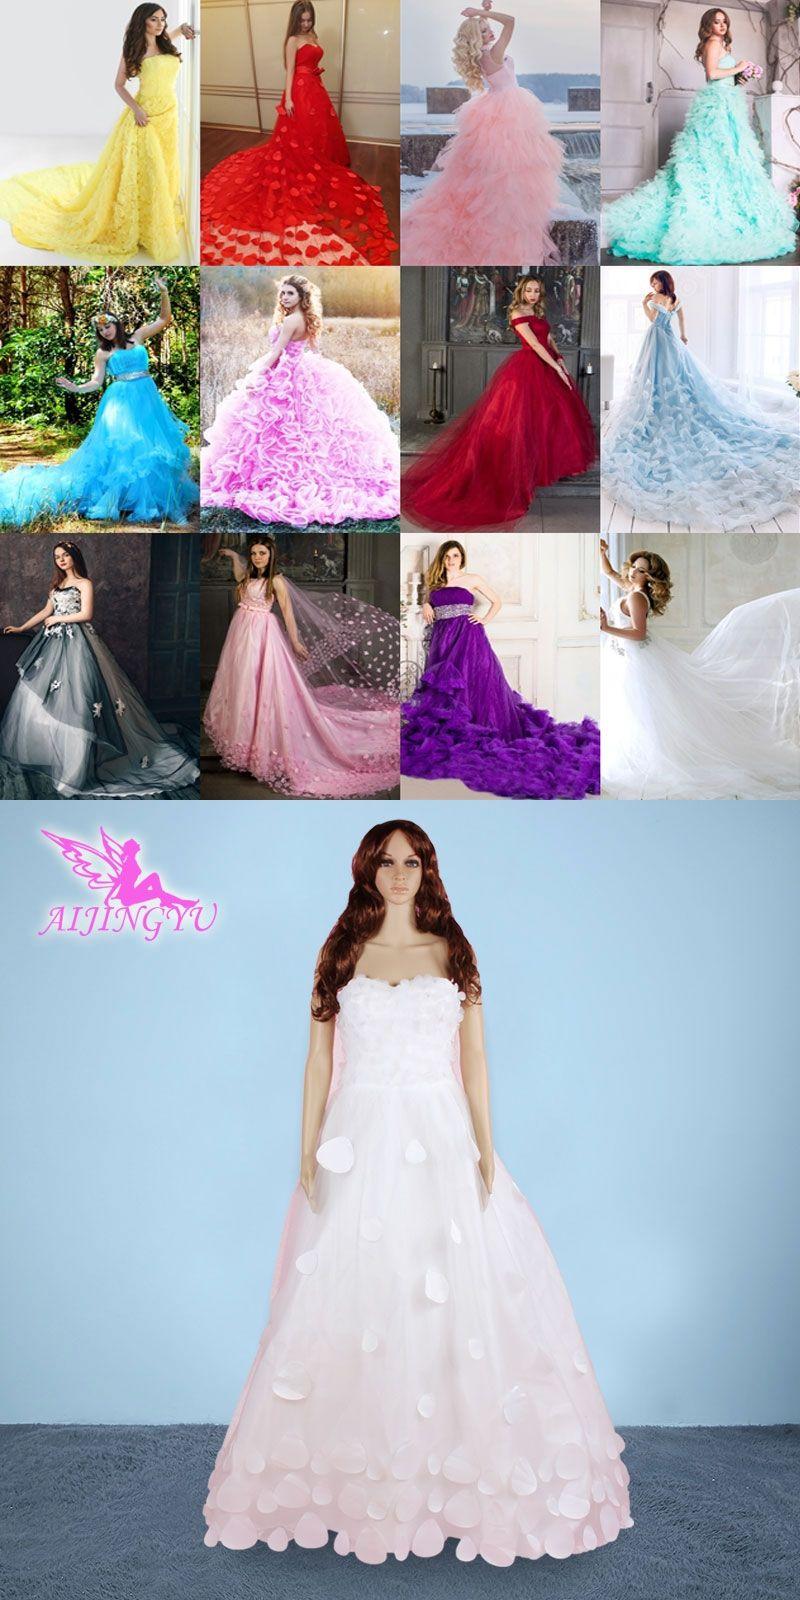 Aijingyu new free shipping china bridal gowns cheap simple